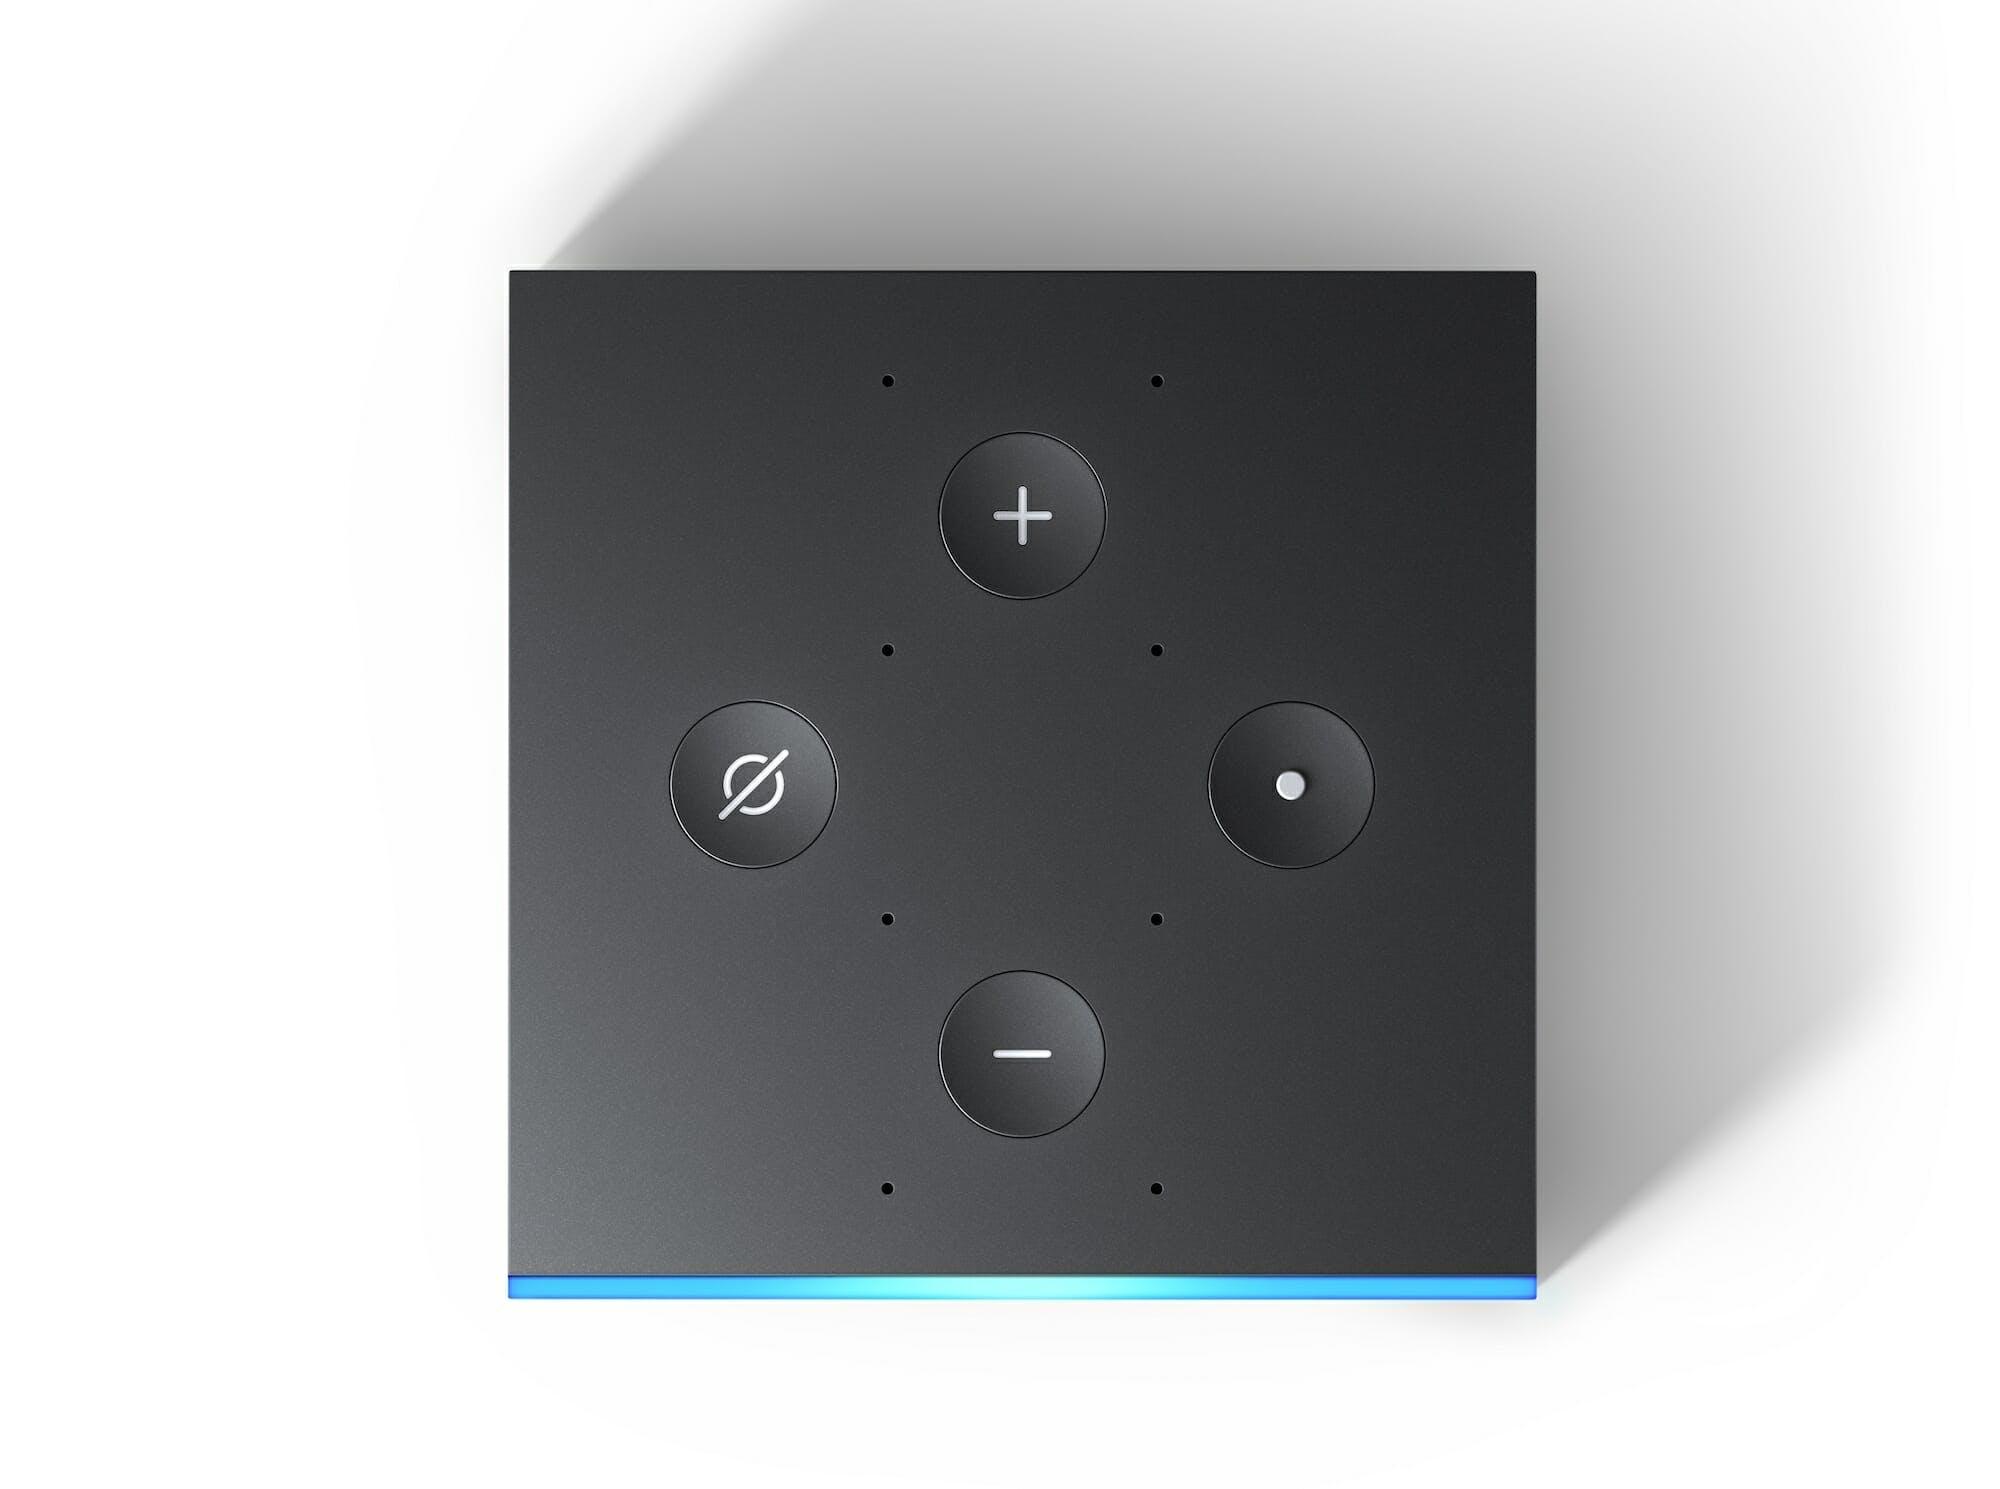 Amazon Fire TV Cube top